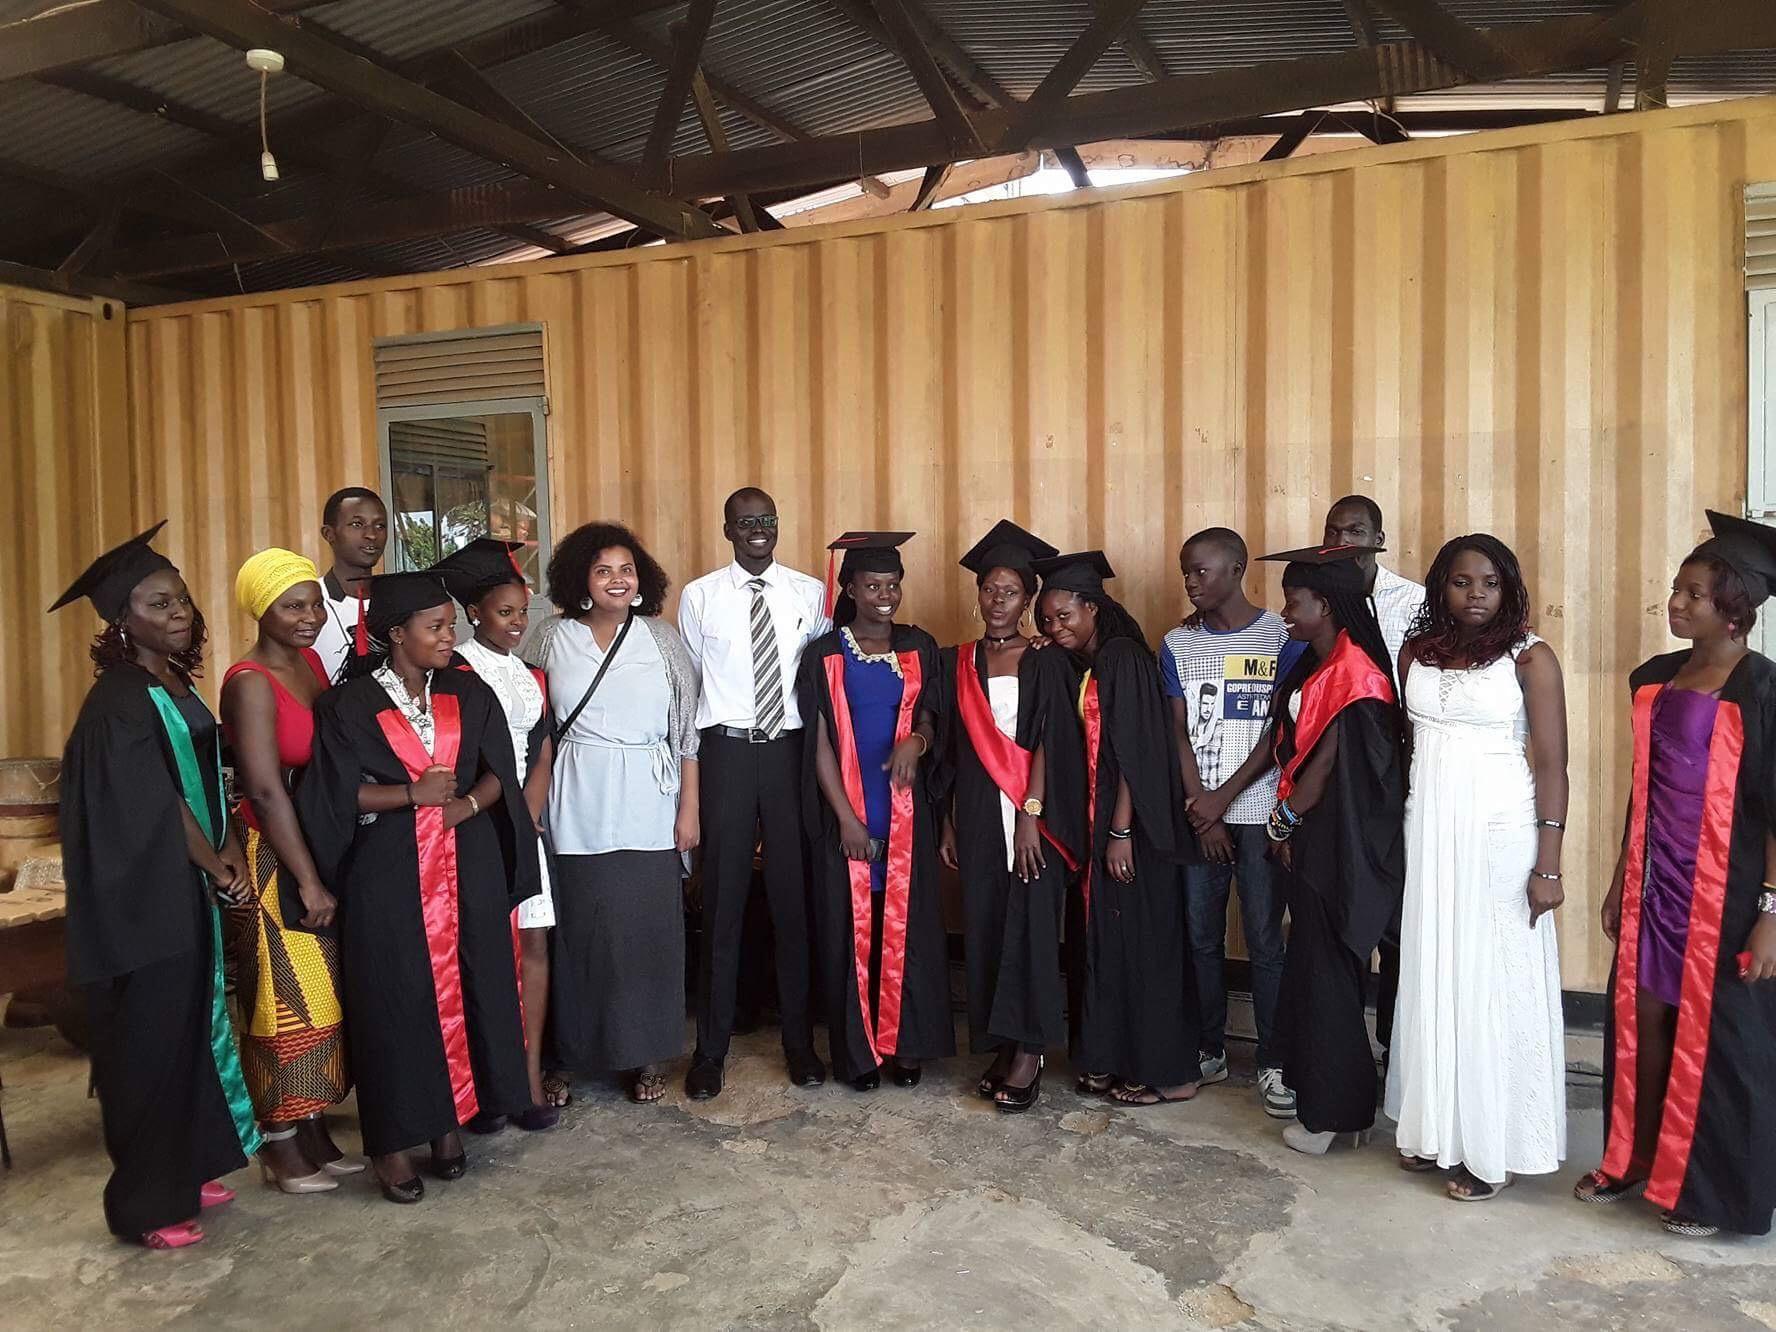 Graduation Festivities at Fontes Foundation